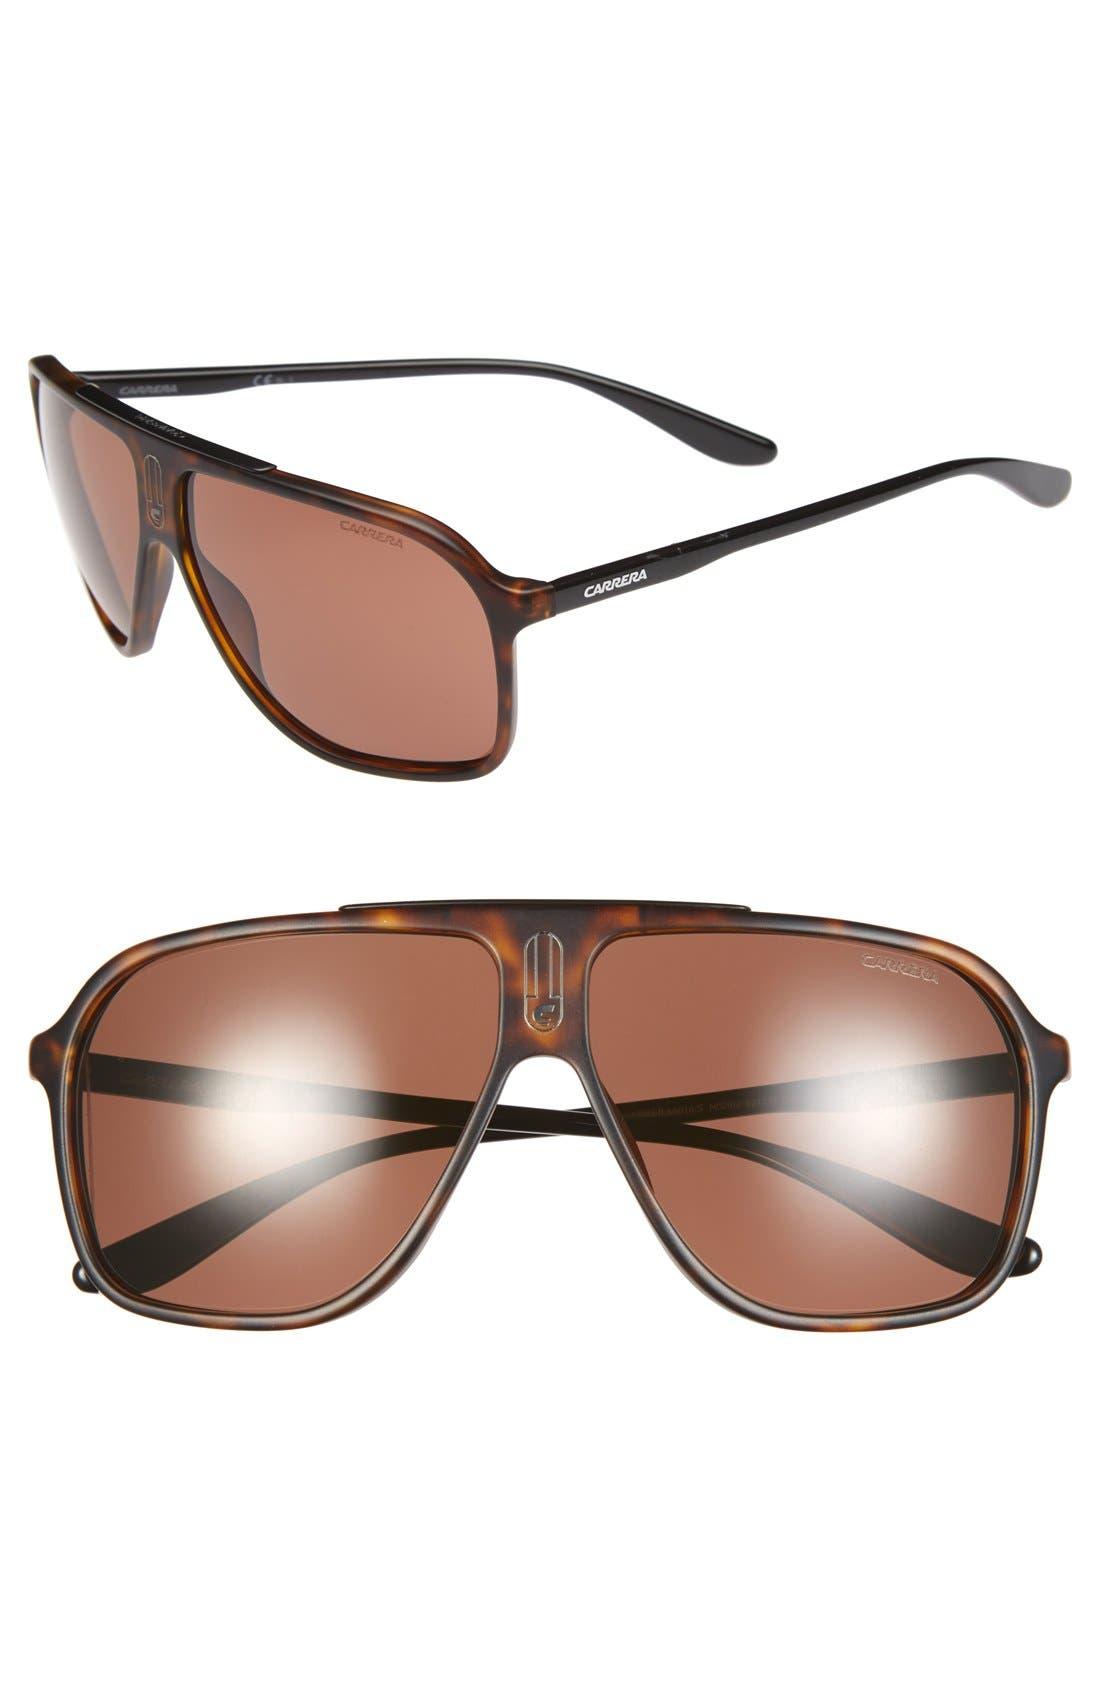 62mm Sunglasses,                             Main thumbnail 2, color,